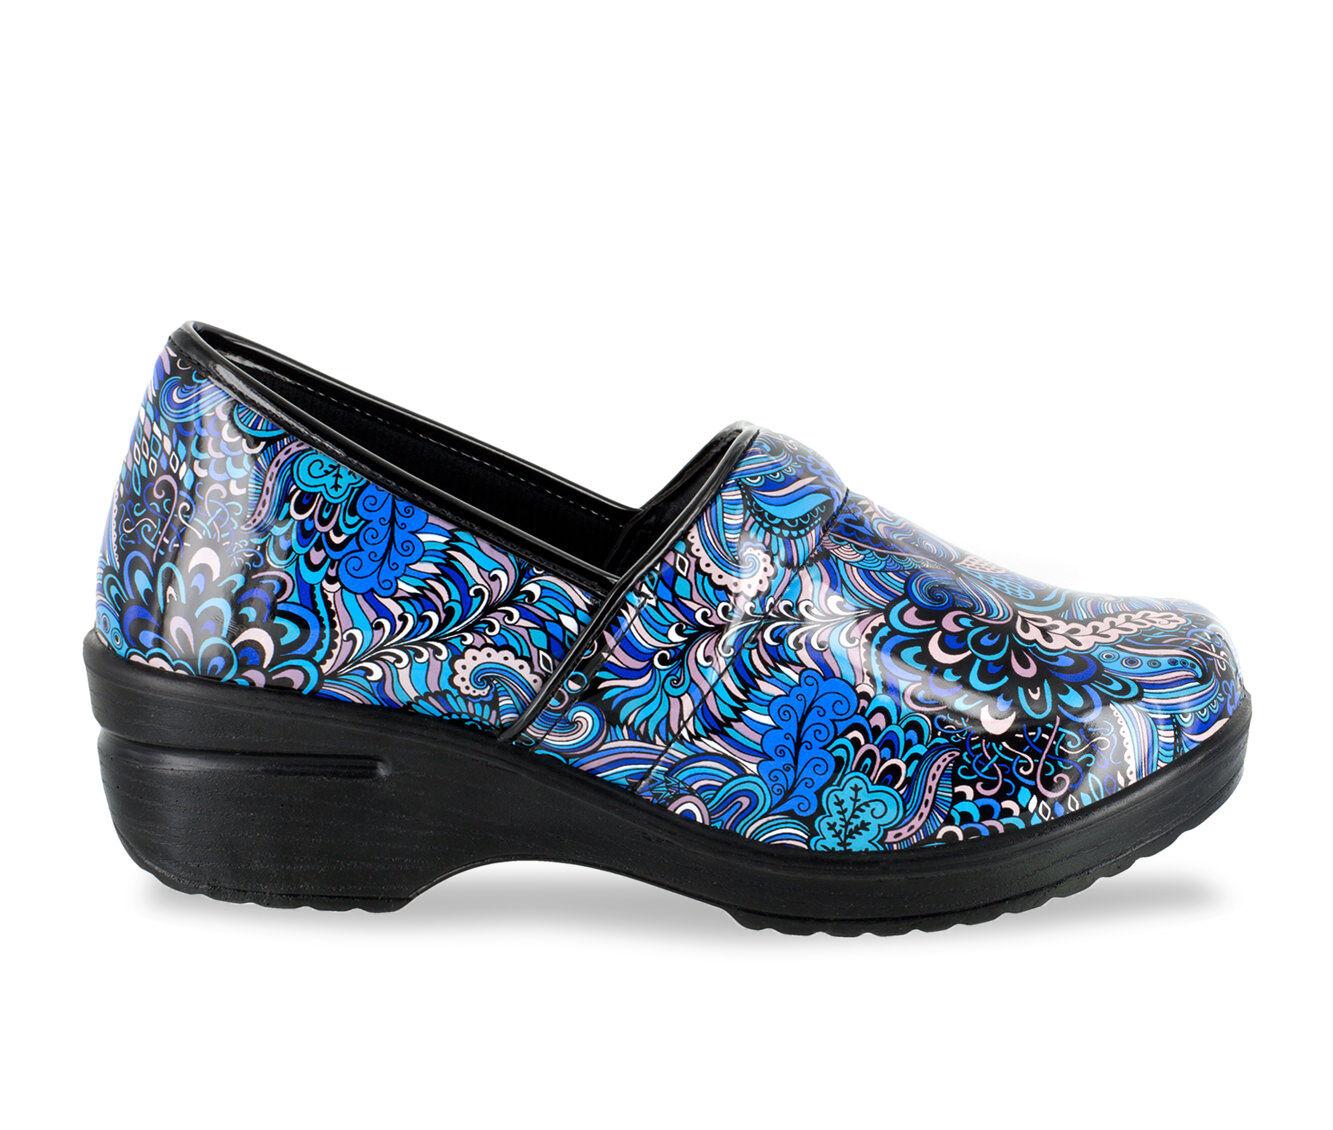 Women's Easy Works by Easy Street Lyndee Slip-Resistant Clogs Blue Pop